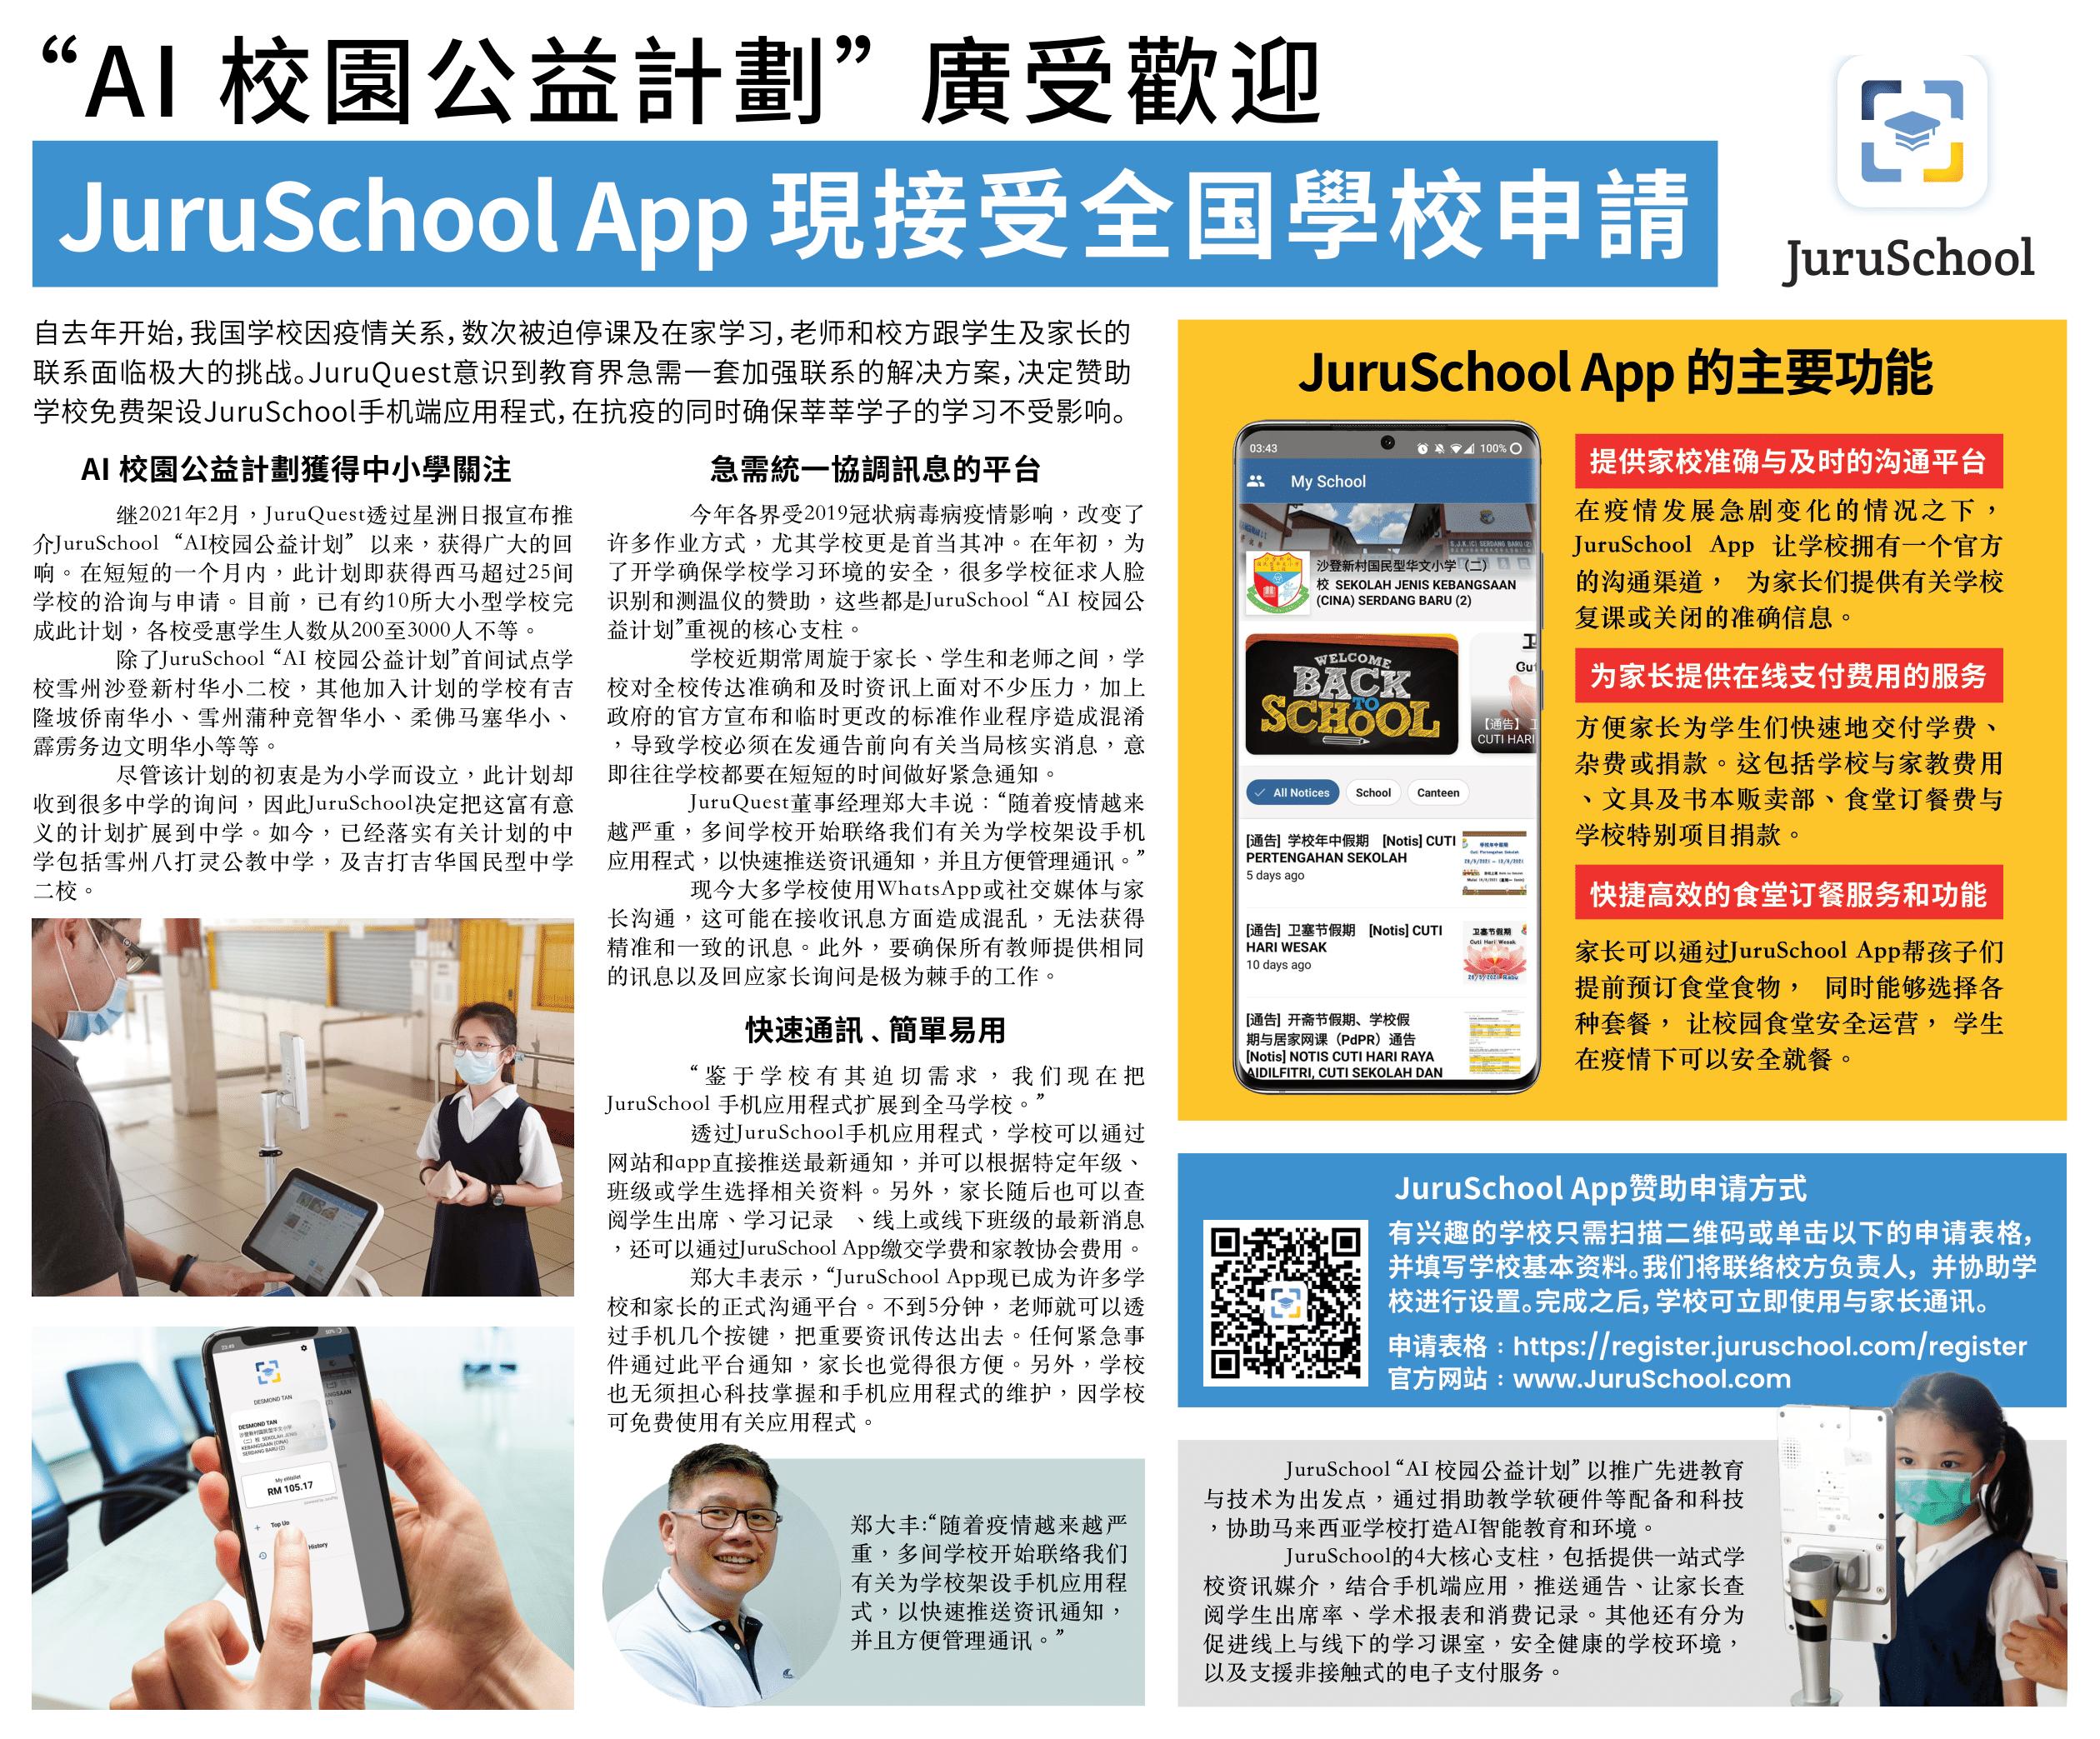 """AI 校園公益計劃"" 廣受歡迎 – JuruSchool App 現接受全国學校申請"